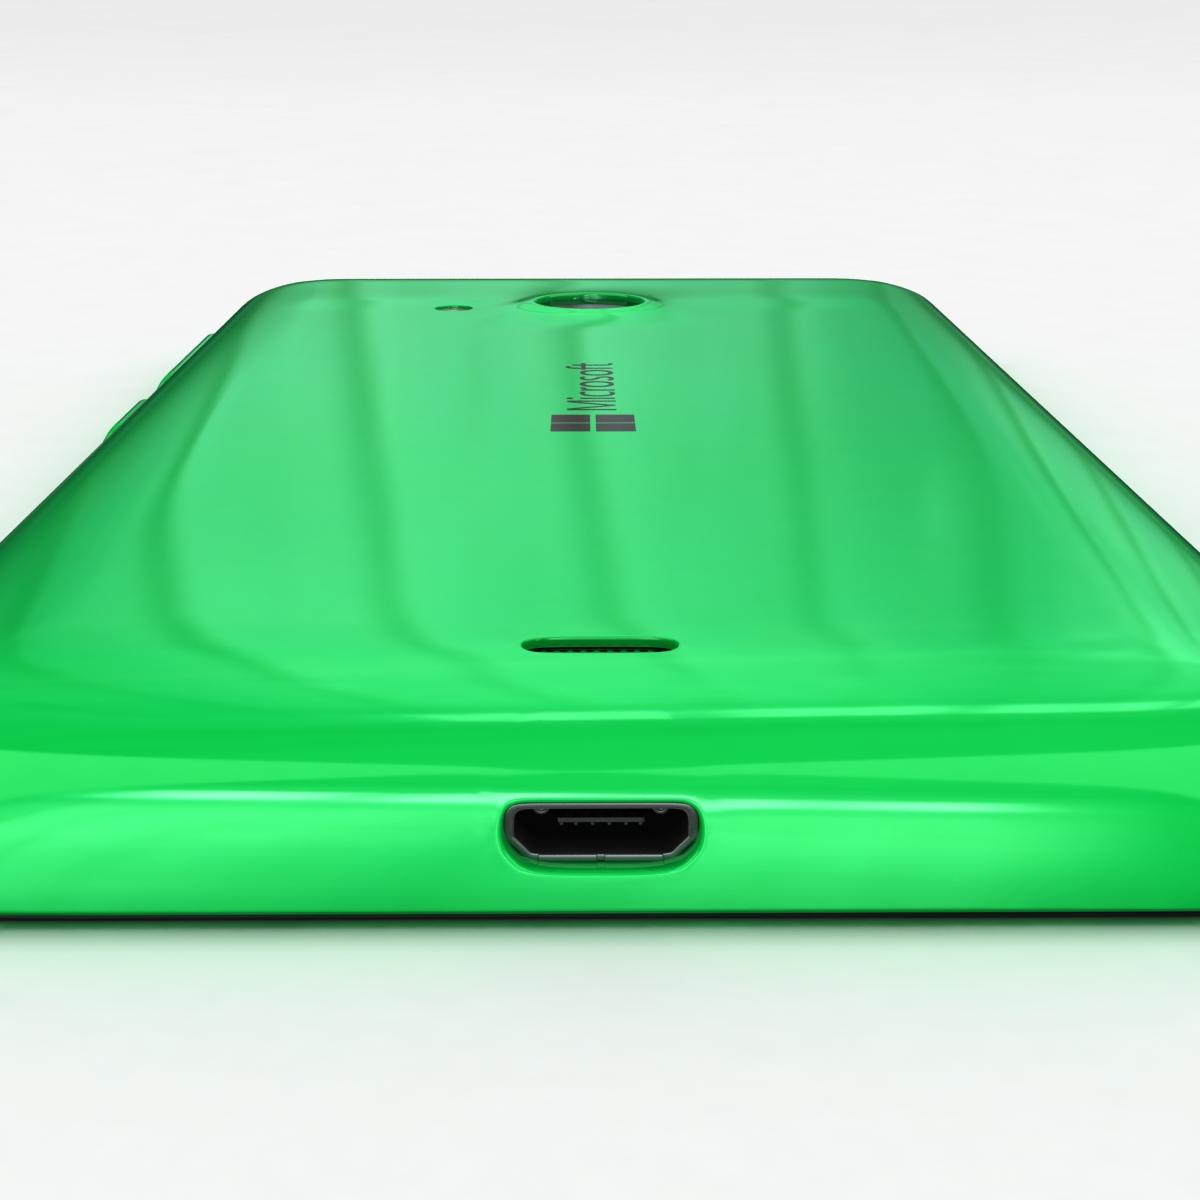 microsoft lumia 535 and dual sim green 3d model 3ds max fbx c4d obj 204177